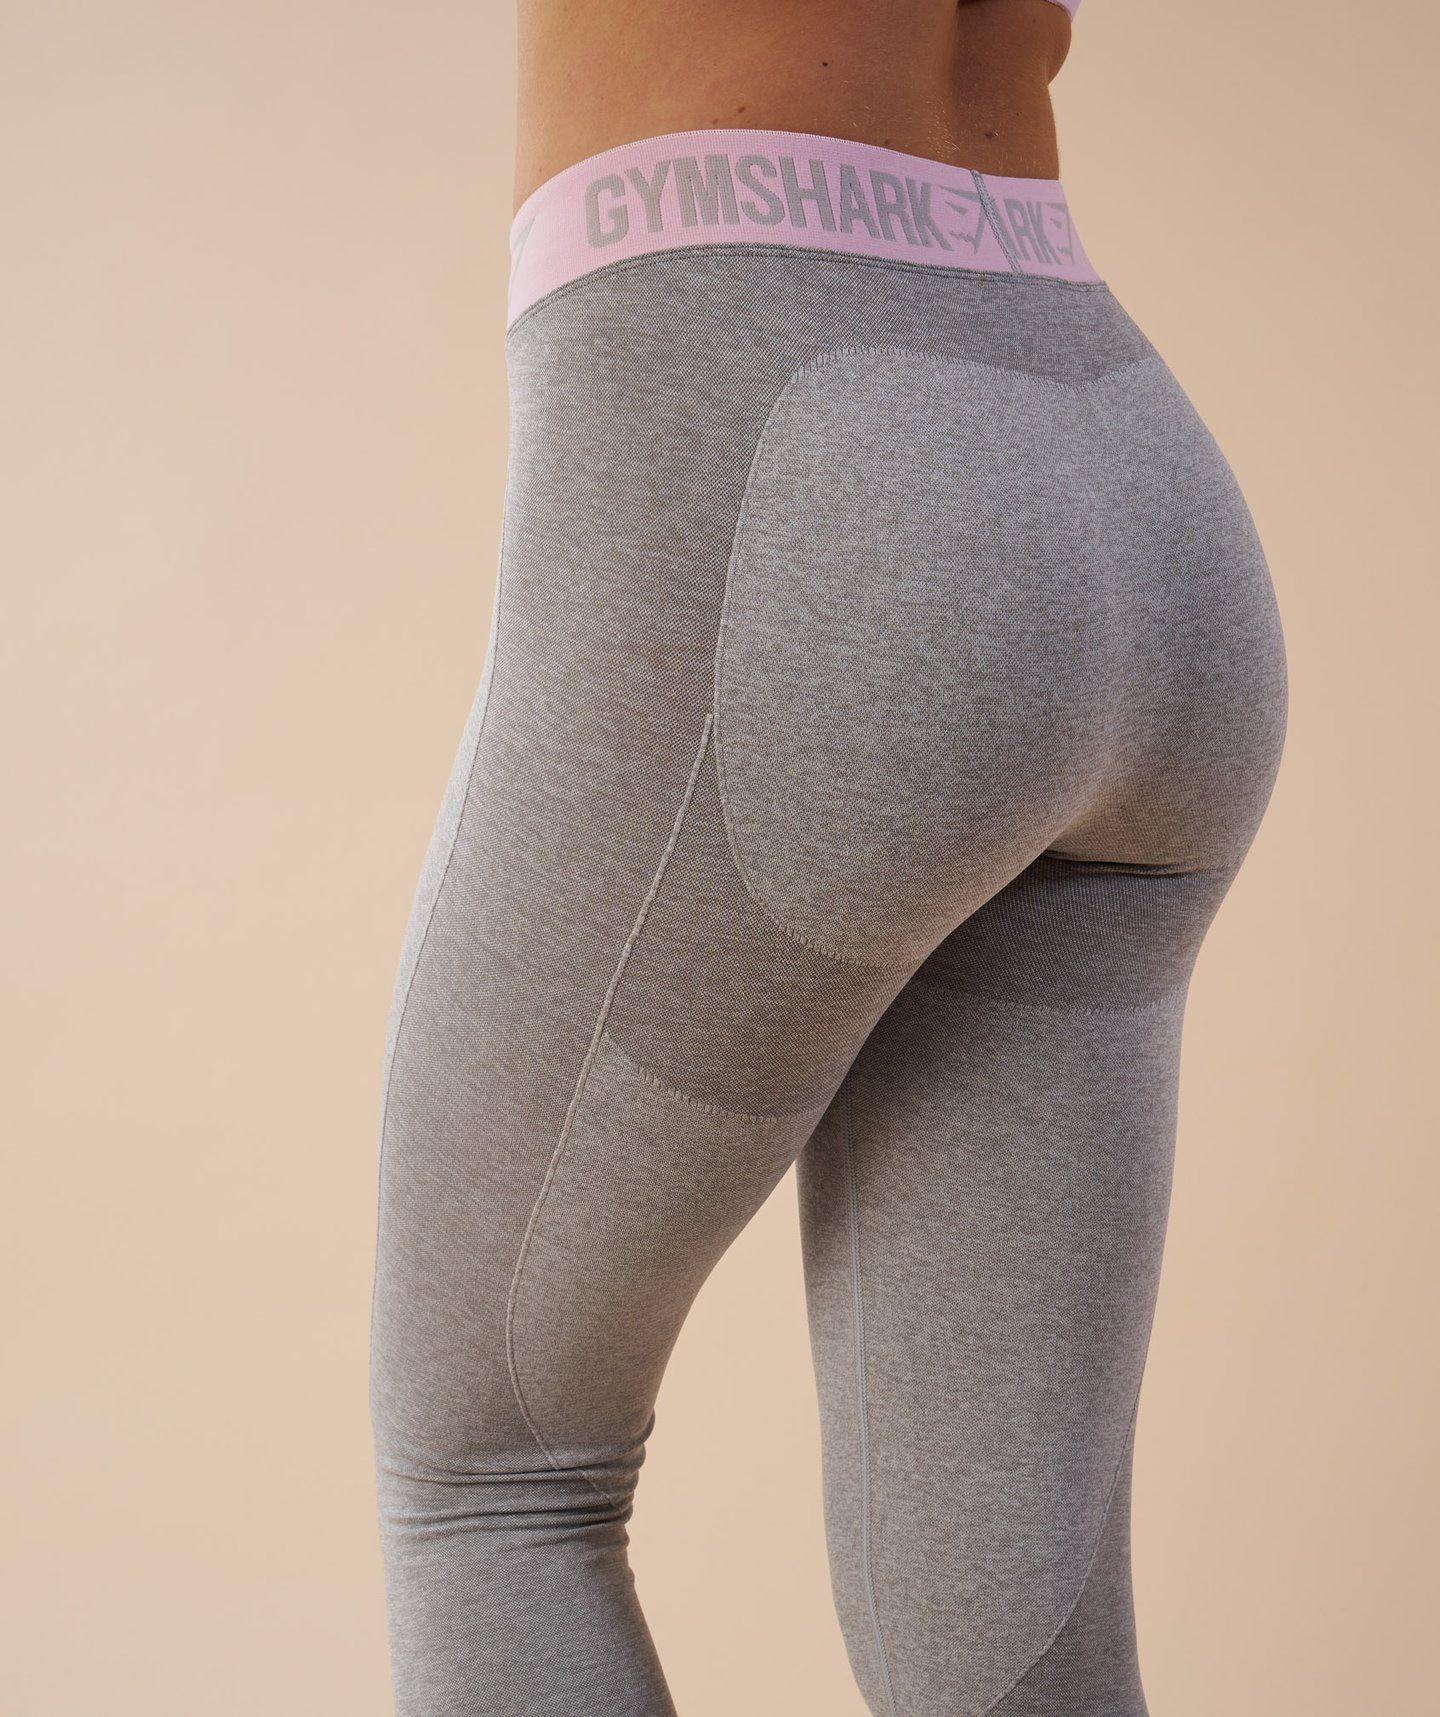 a45a72234b84e Gymshark Flex Leggings - Light Grey Marl/Chalk Pink | Size small ...